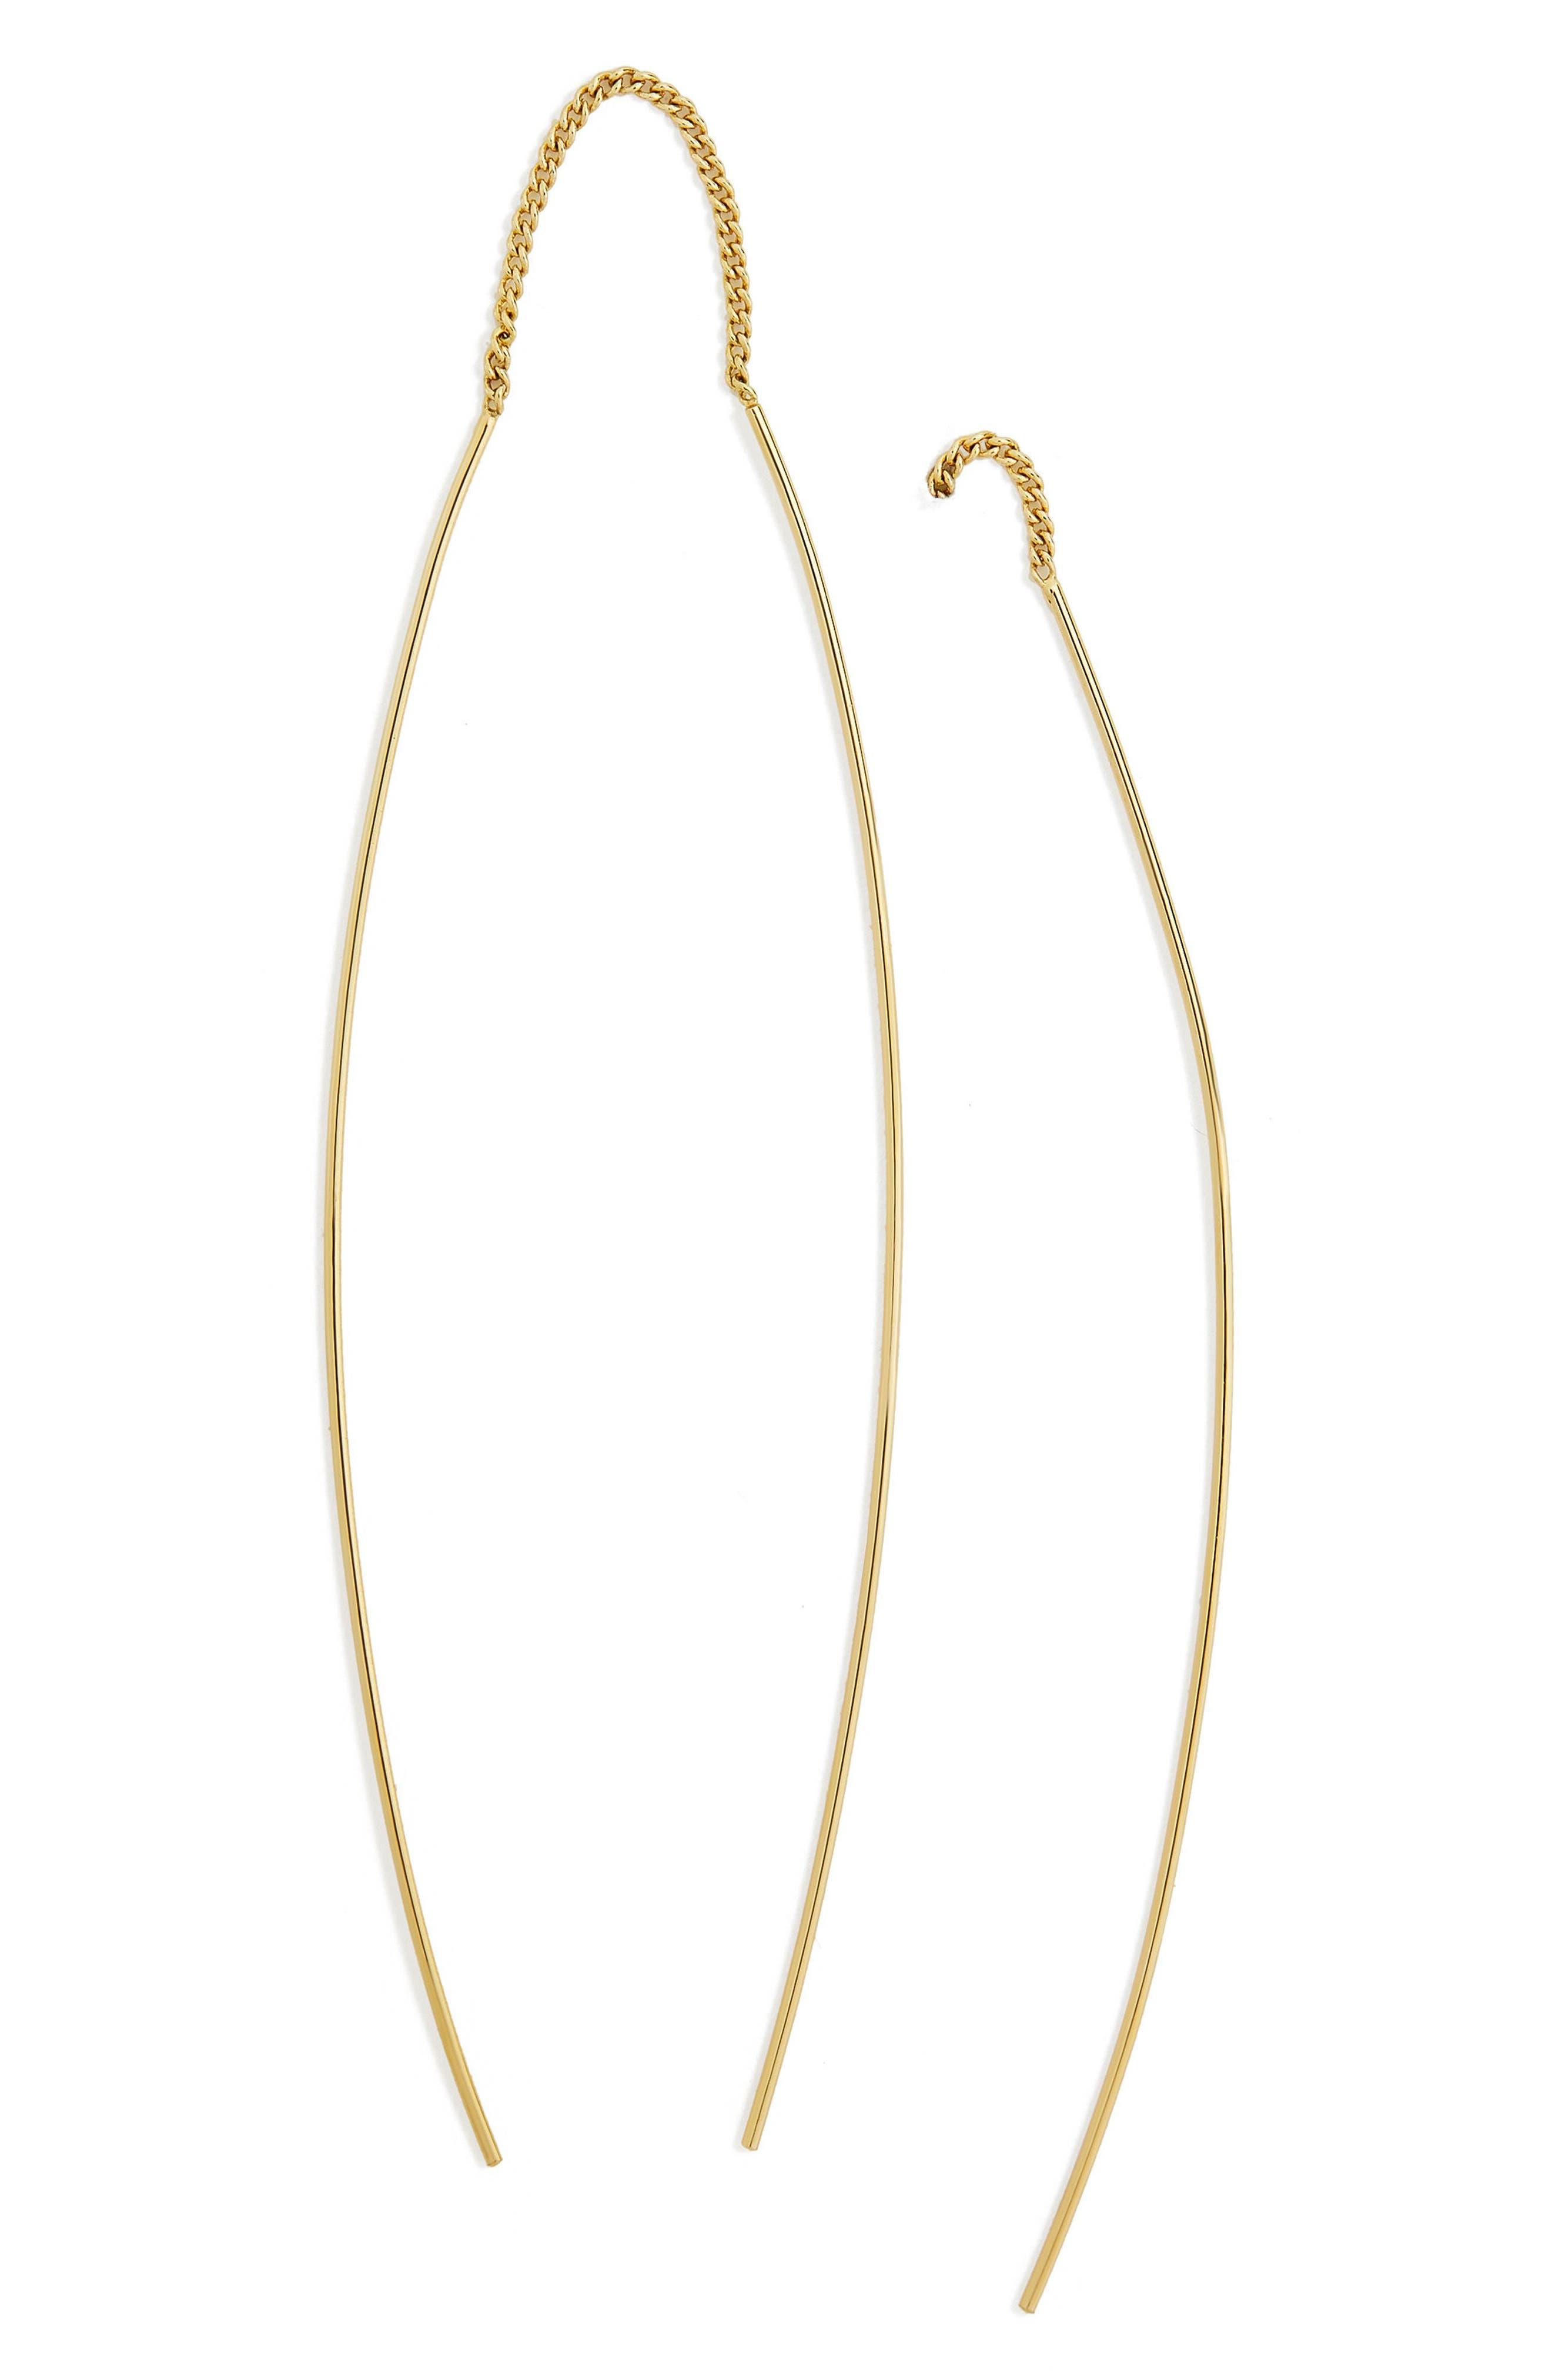 Dancer Threader Drop Earrings,                         Main,                         color, Gold